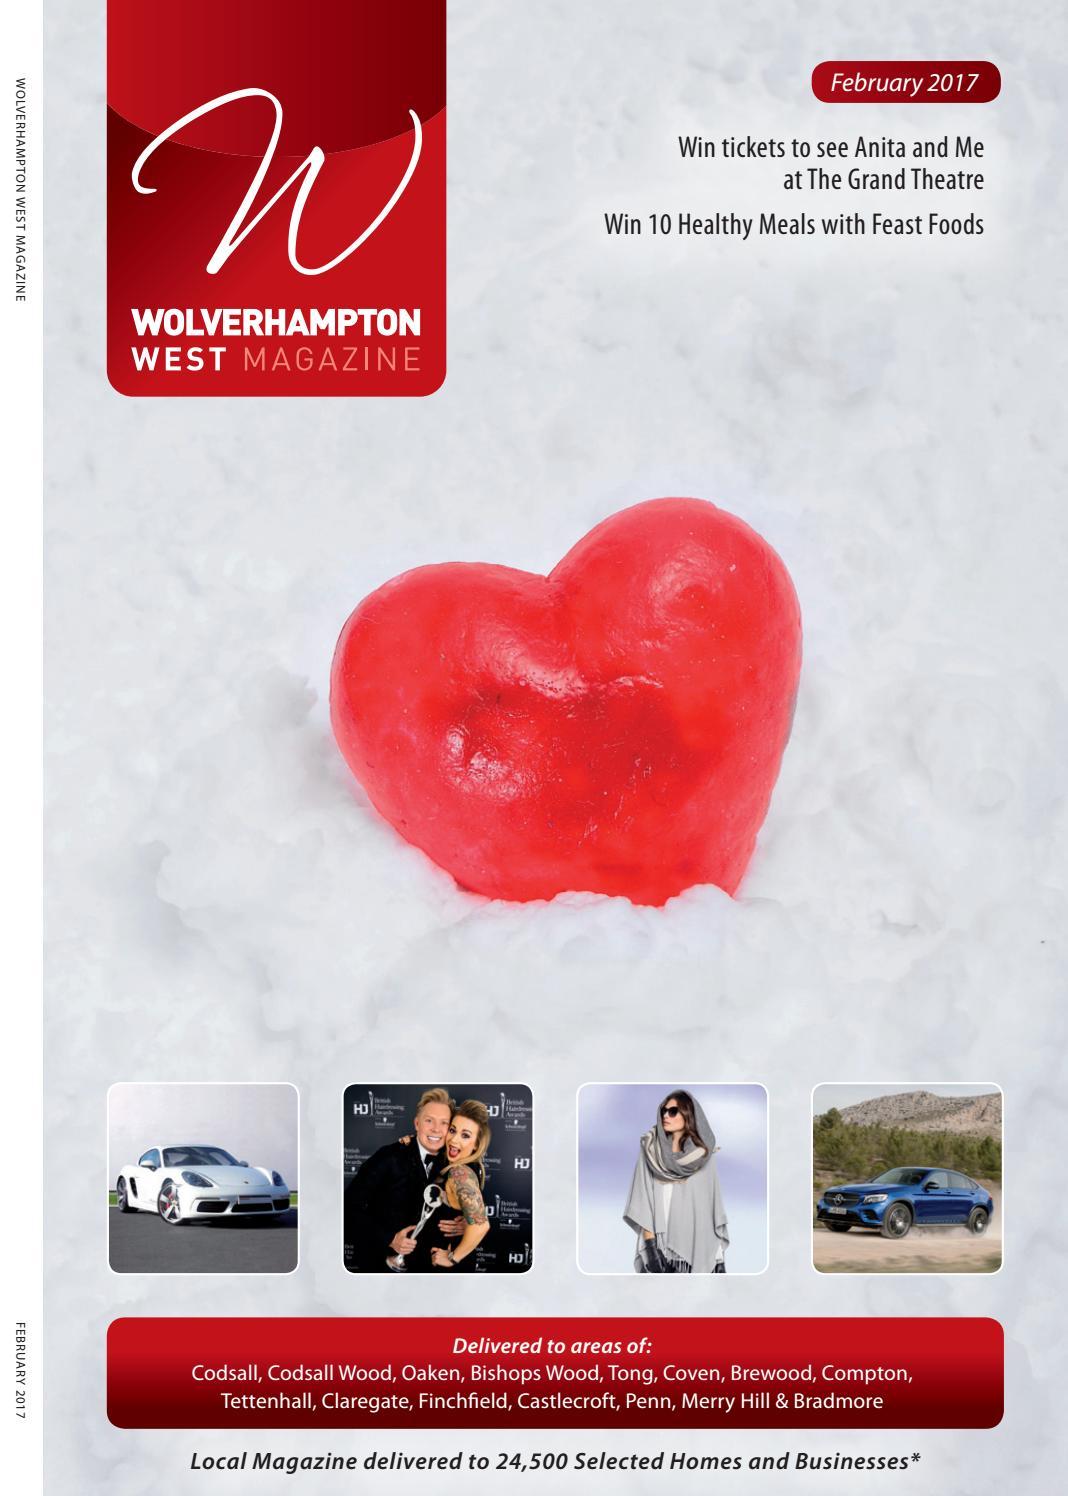 Wolverhampton West Magazine February 2016 By Jonathon Issuu Circuit Board Tshirt Art Print Callum Ritchie Society6